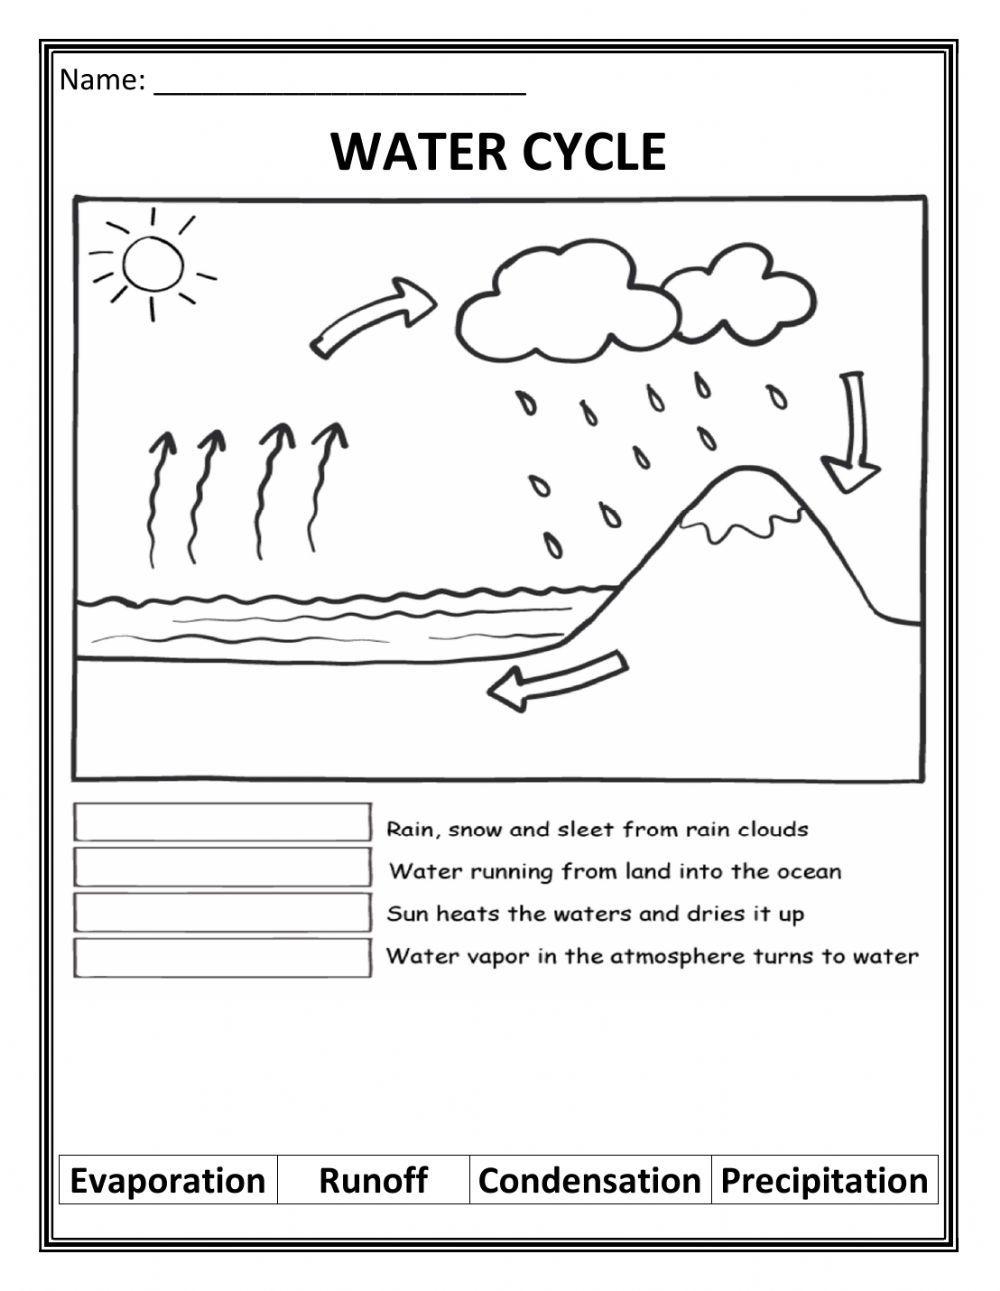 Water Cycle Interactive Worksheet In 2020 Water Cycle English Lessons For Kids Water Cycle Worksheet